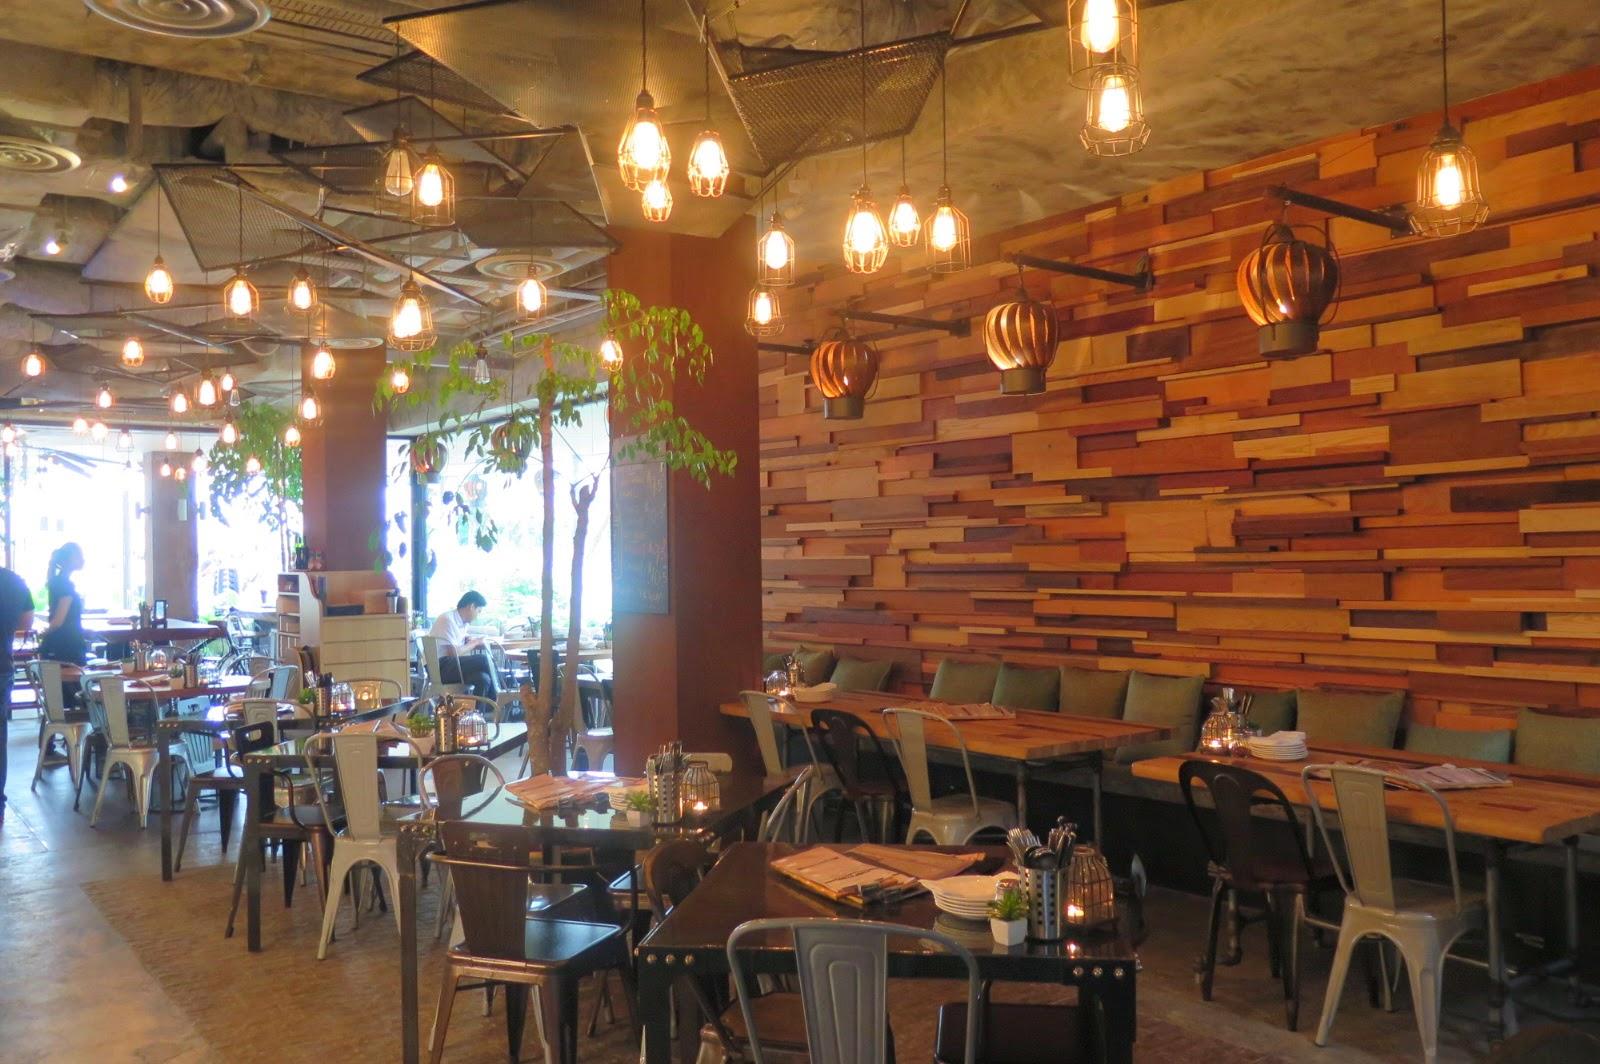 Italian Bistro Kitchen Decorating Ideas Remodel Okc Supply And Demand Modern Peruvian Rooftop